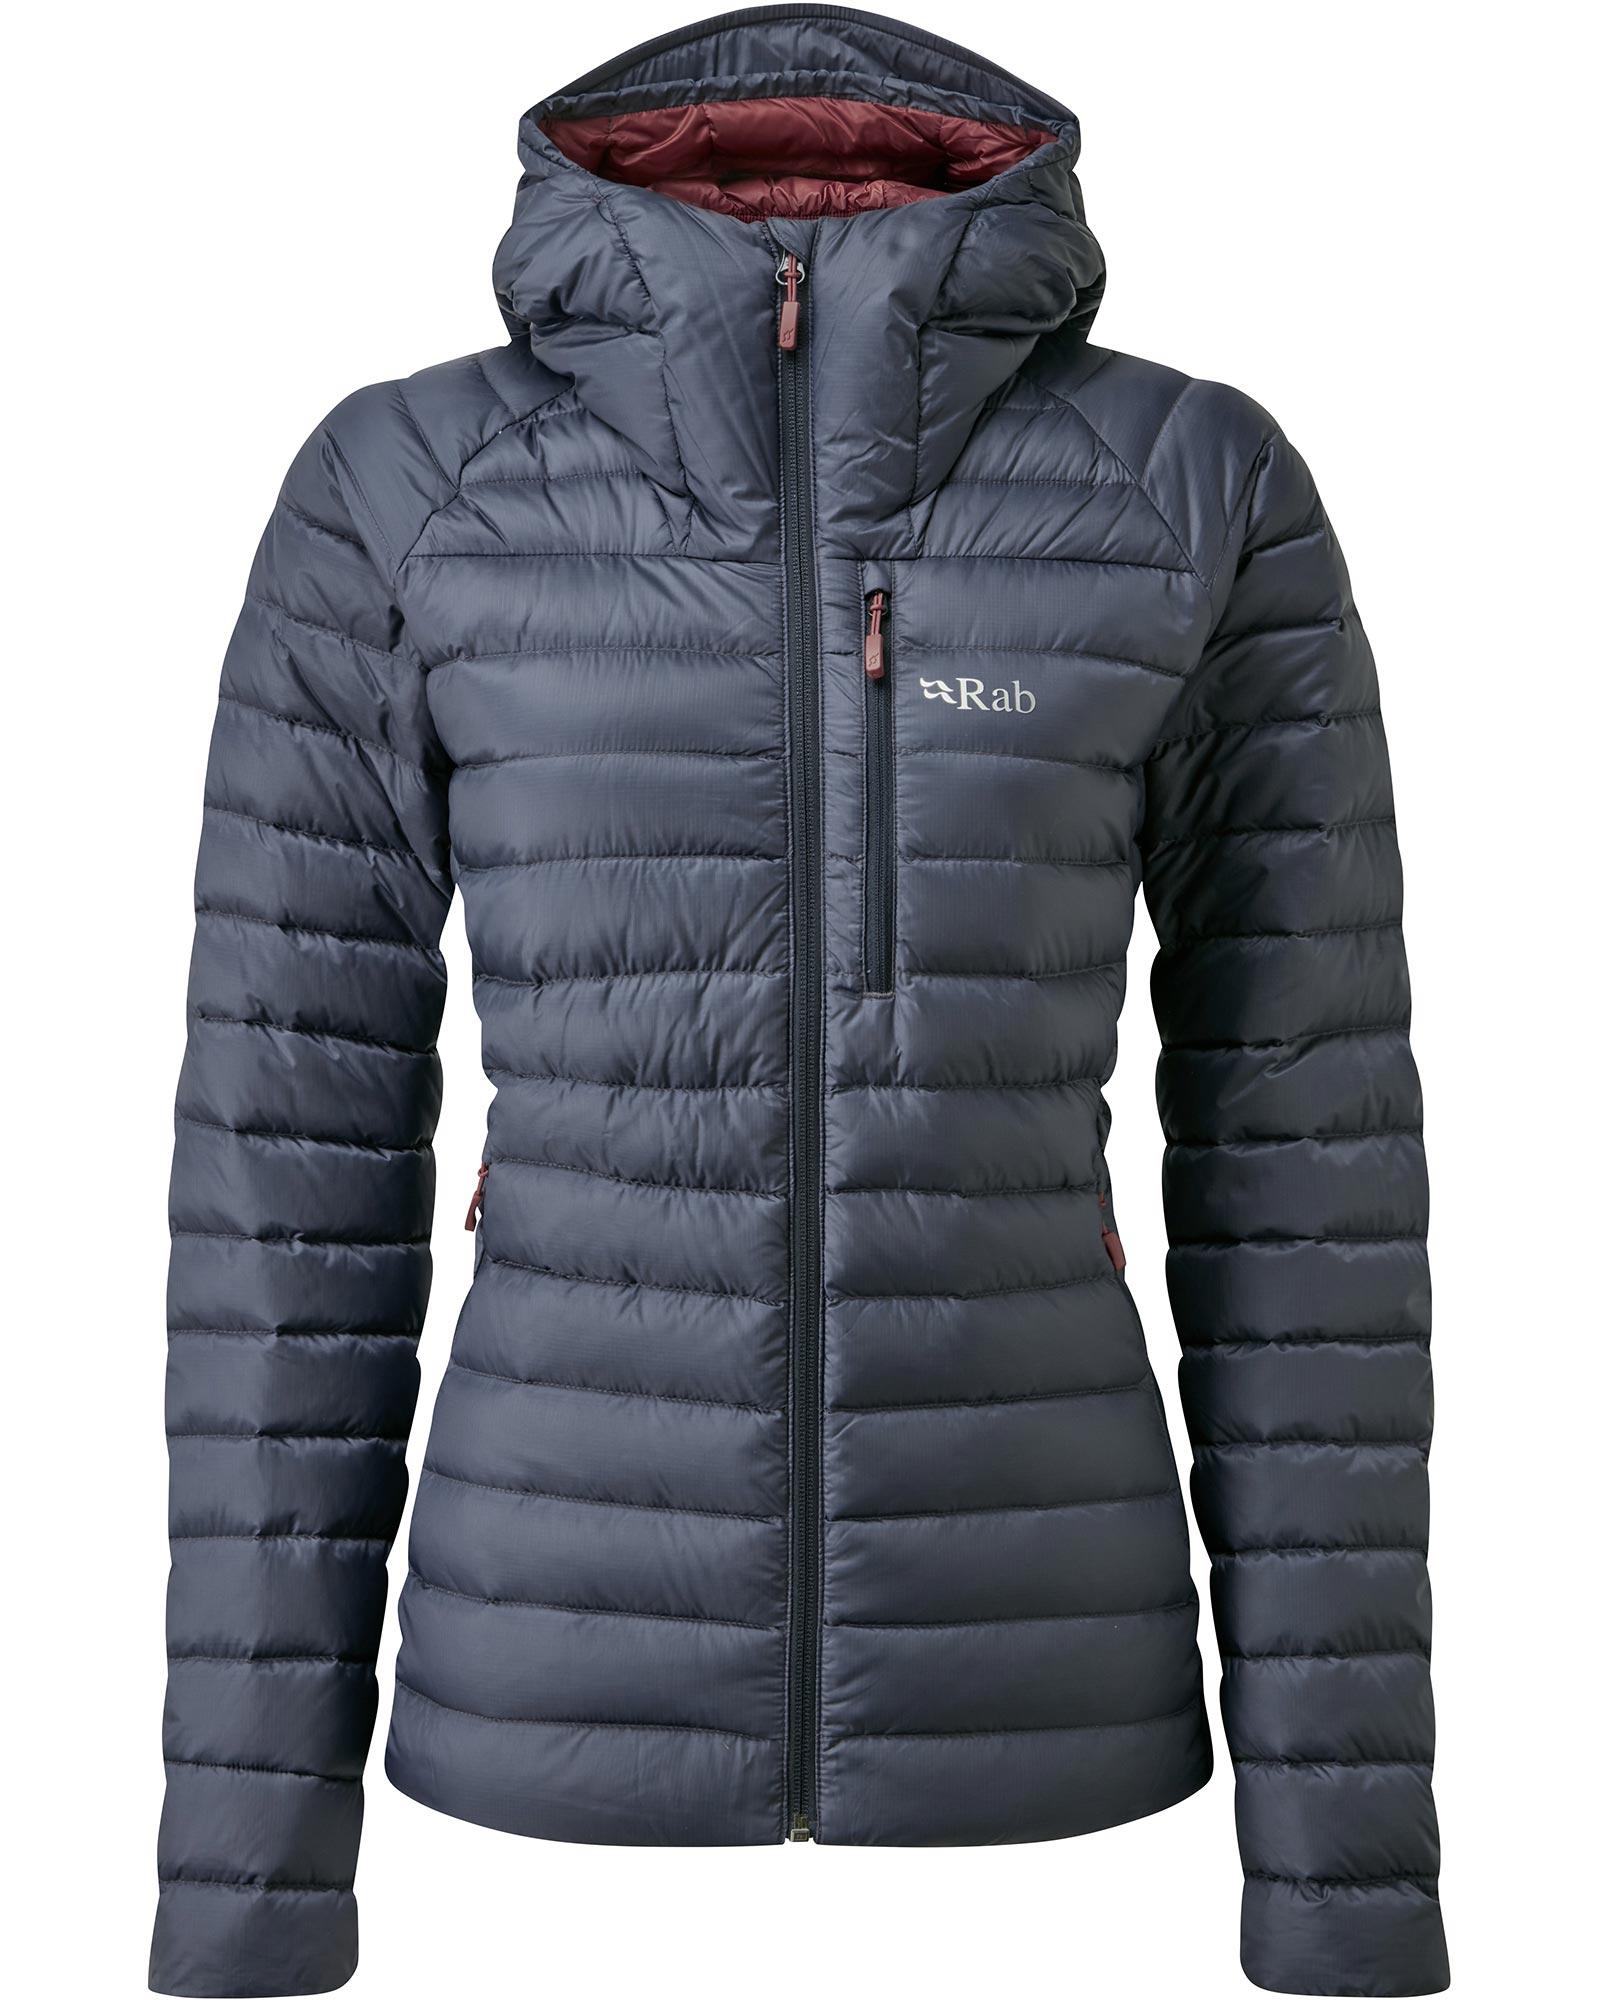 Rab Women's Microlight Alpine Jacket 0